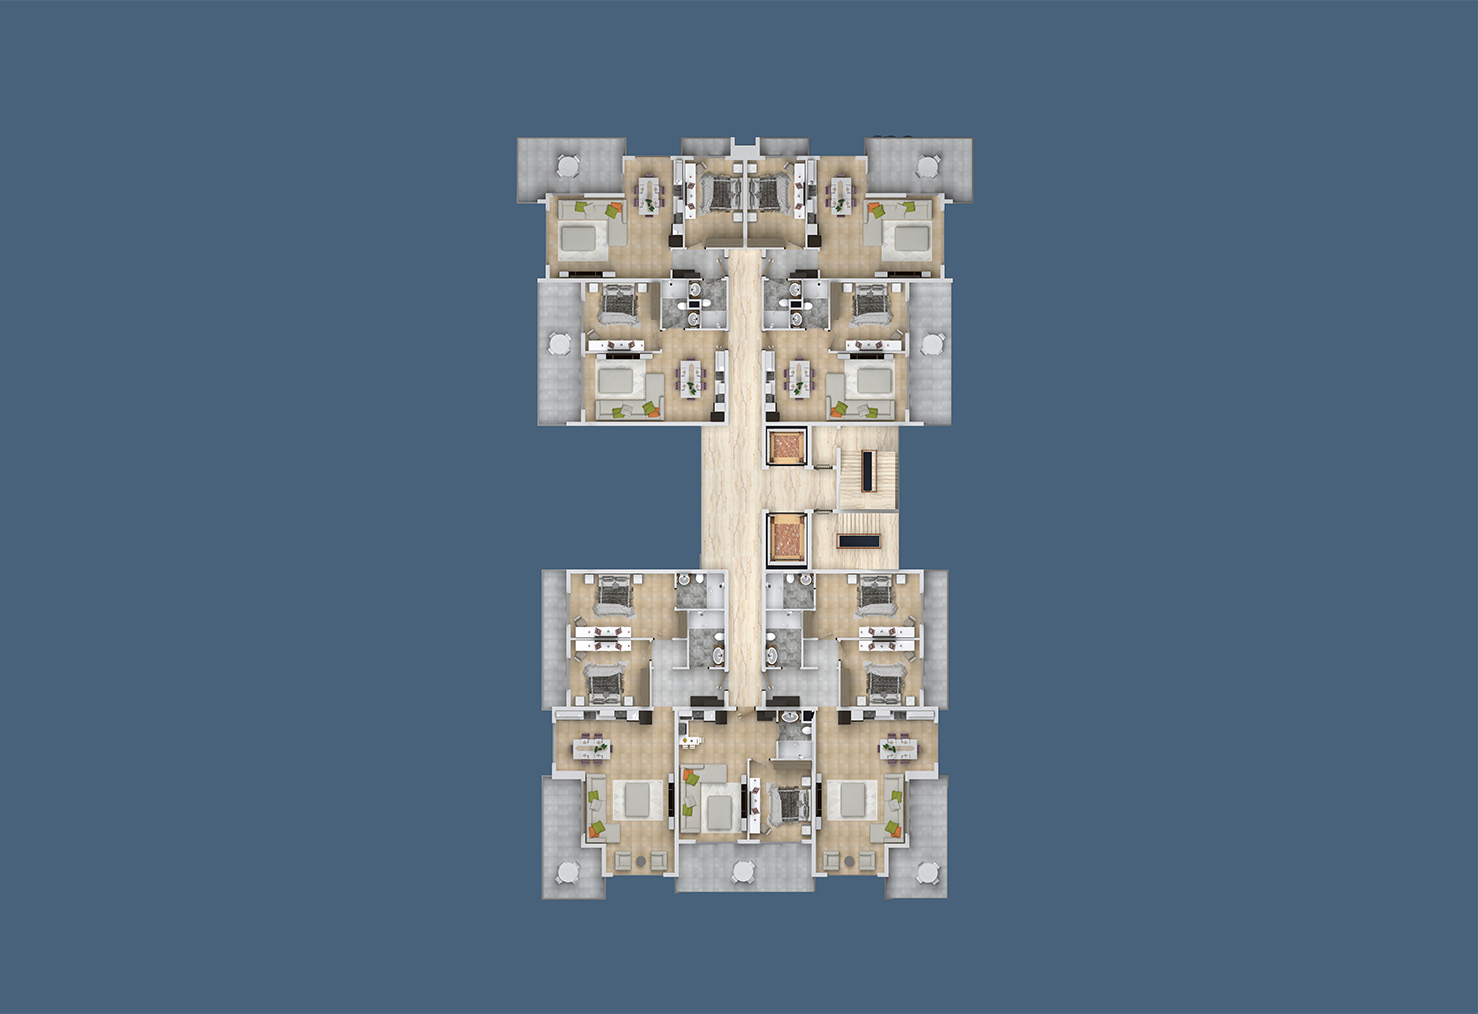 План расположения квартир 8 этаж A Yekta Kingdom Trade Center